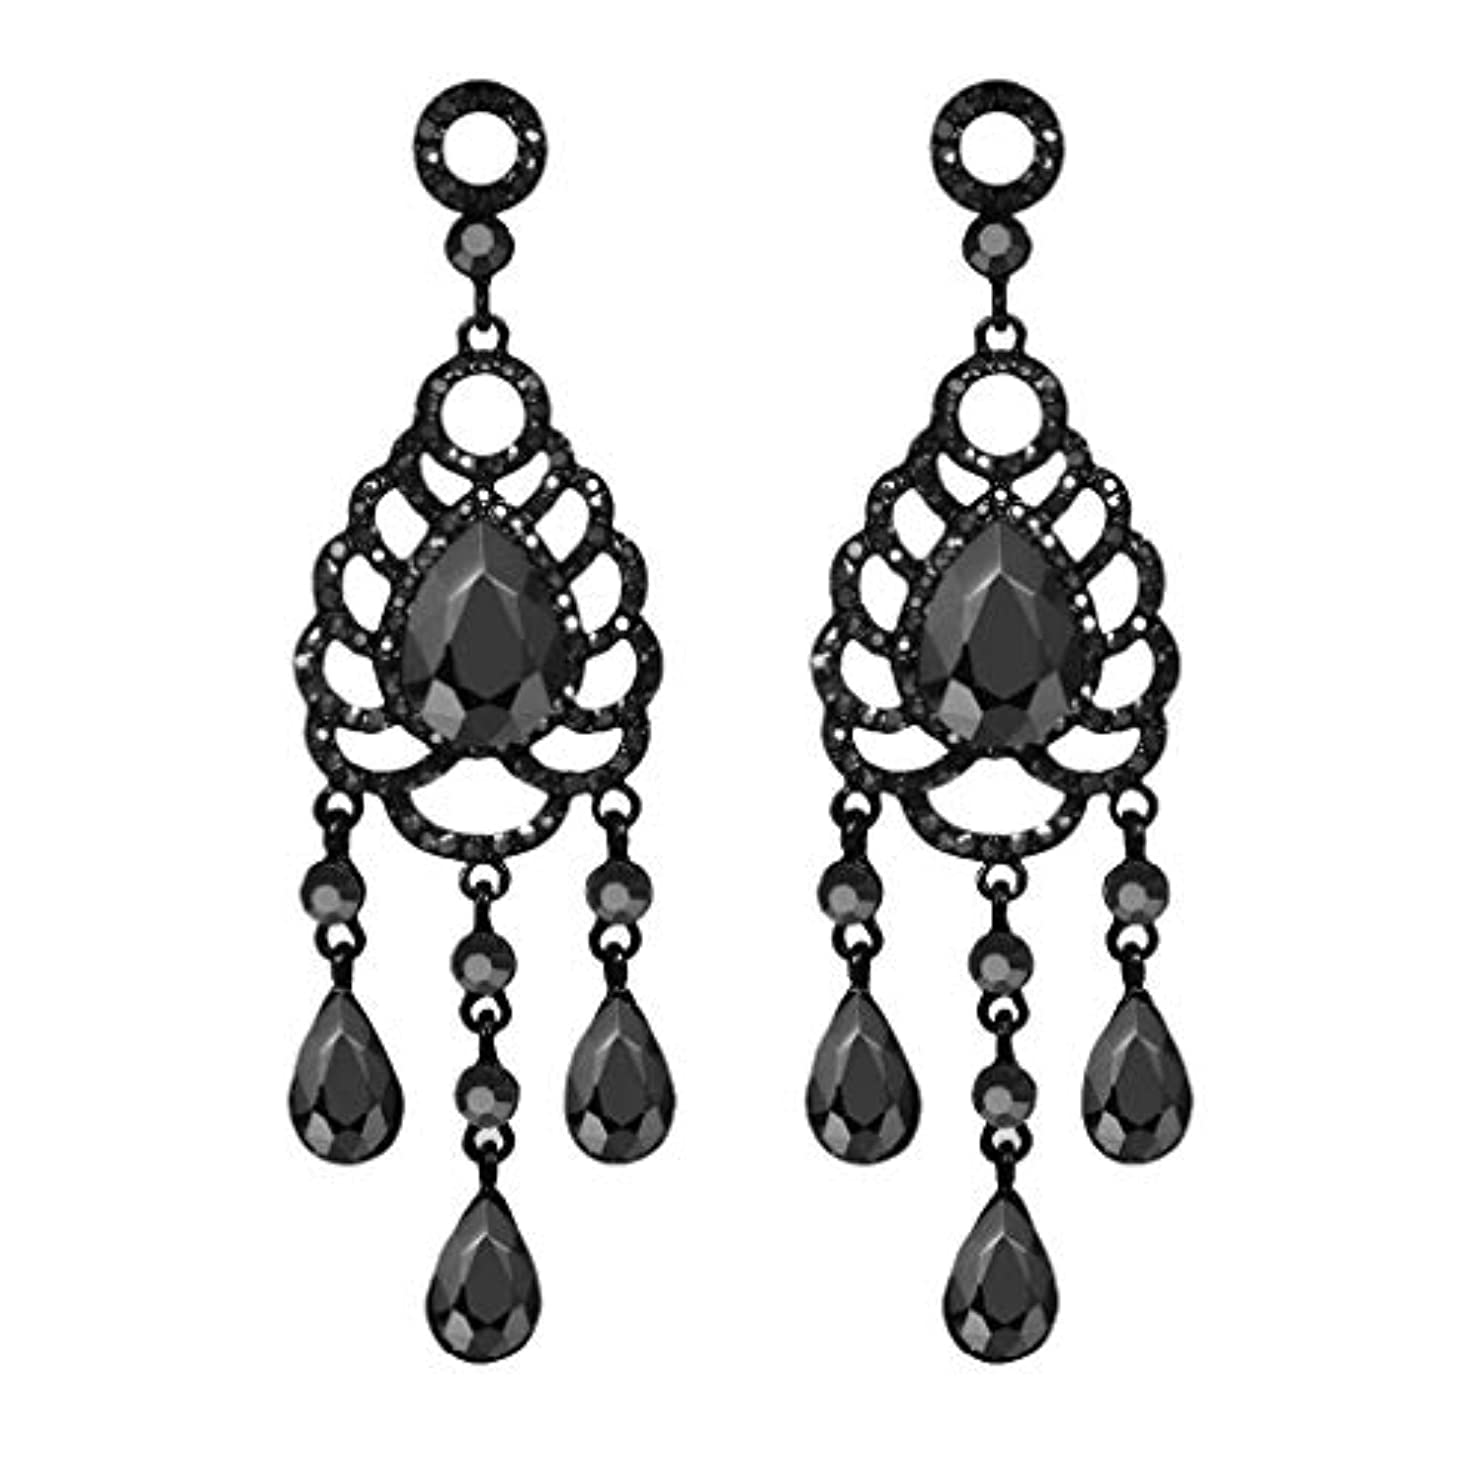 Nicircle 高級エレガントヴィンテージアドバンスブラックメッシュドロップダイヤモンドレディースイヤリングジュエリー Luxury Elegant Vintage Advanced Black Mesh Drop Diamond...